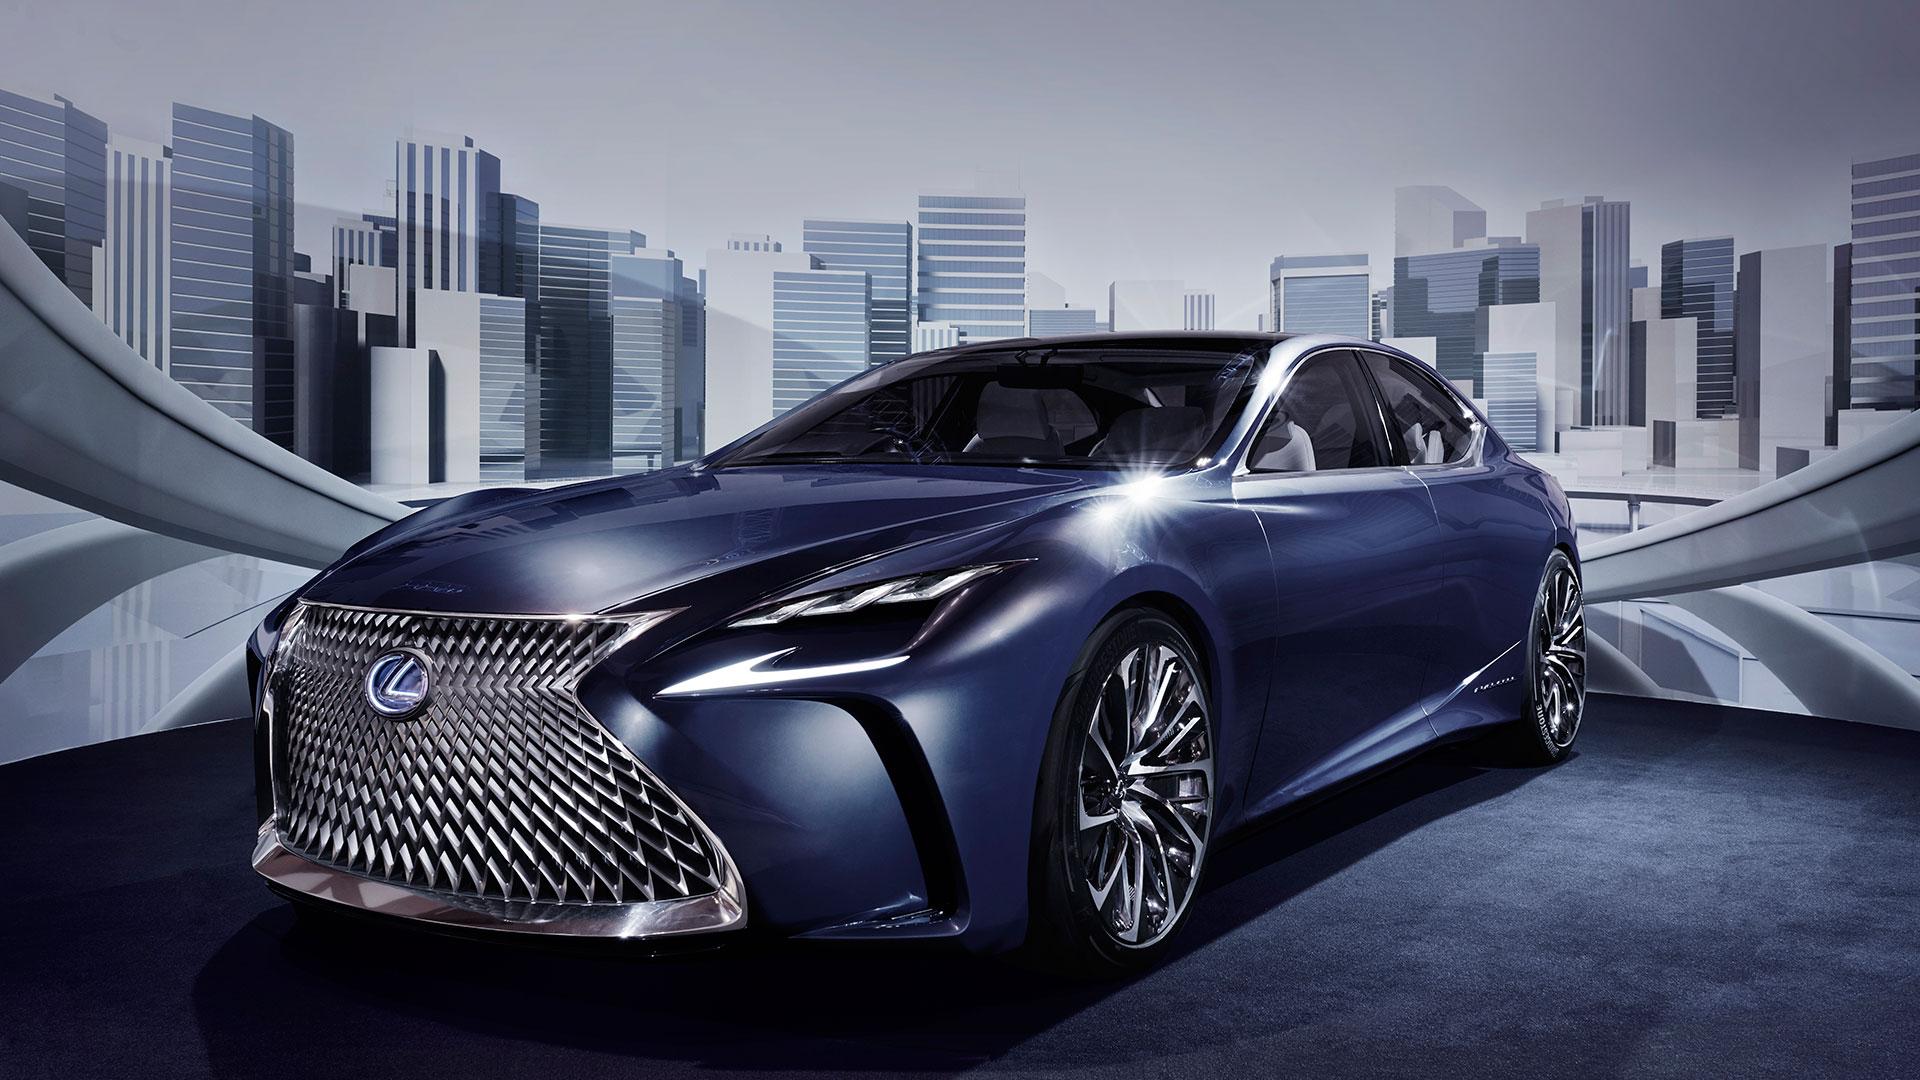 Lexus LF LC Concept hero asset